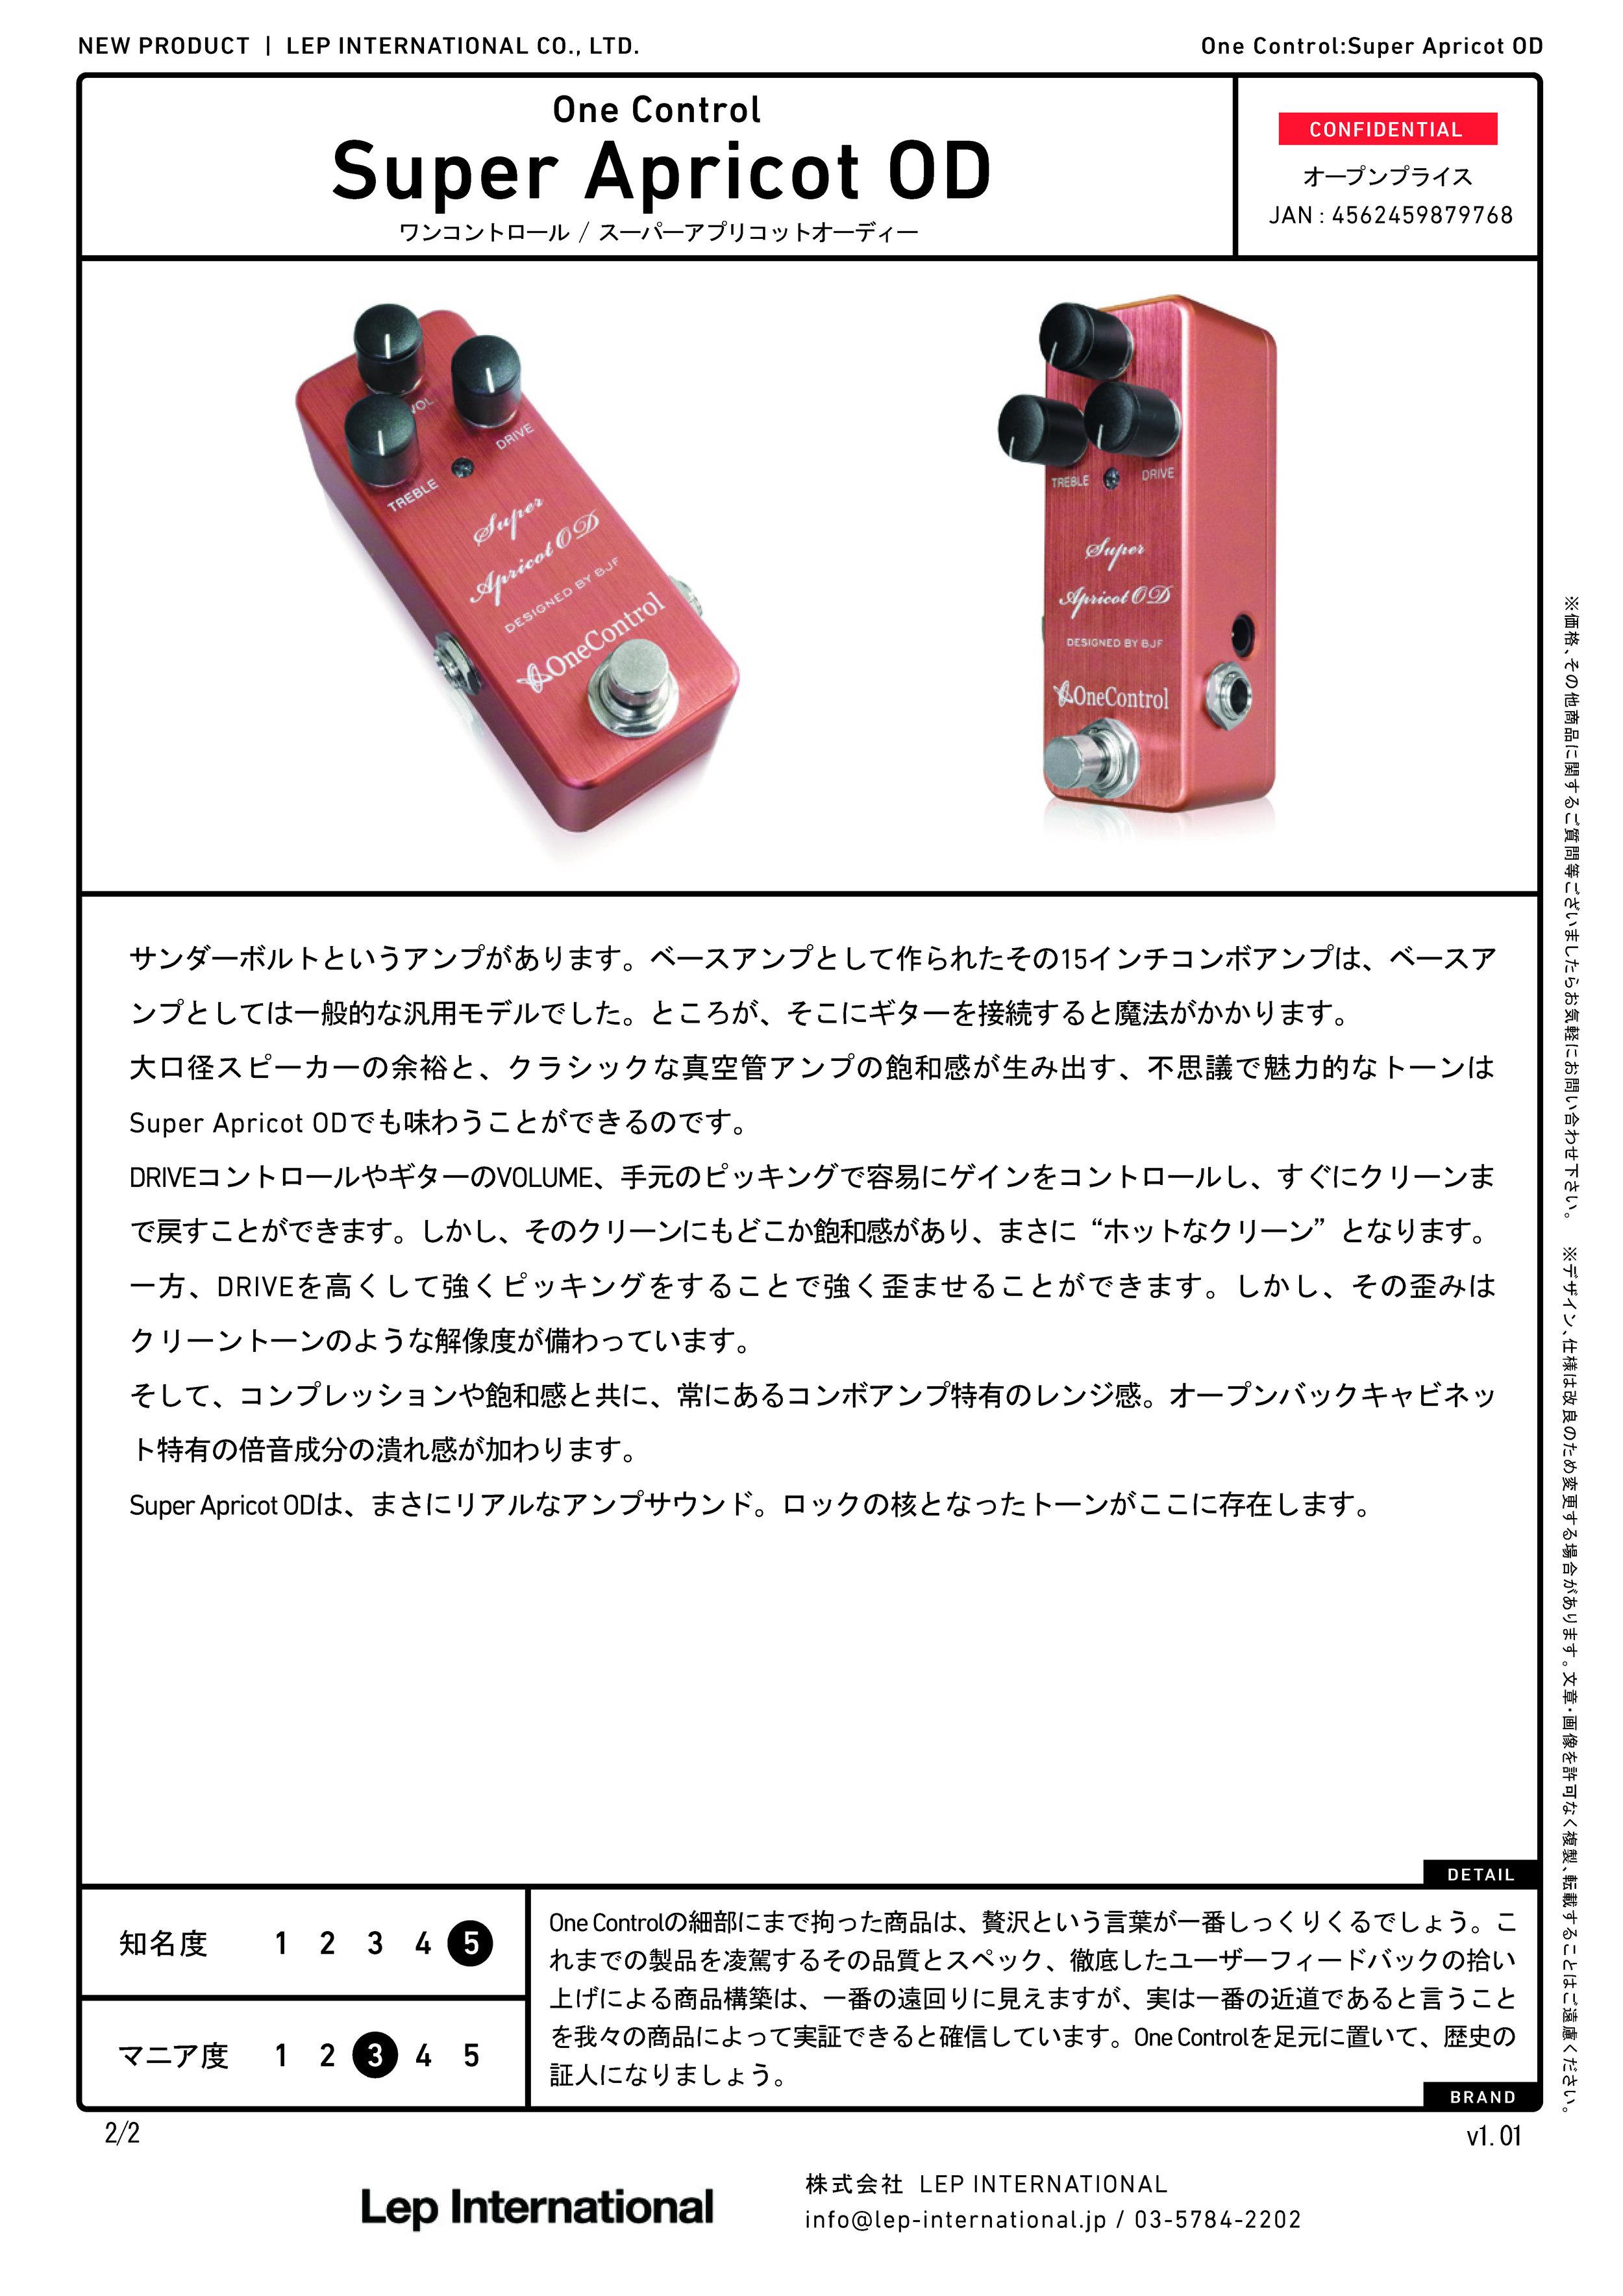 onecontrol superapricotod v1.01_ページ_2.jpg